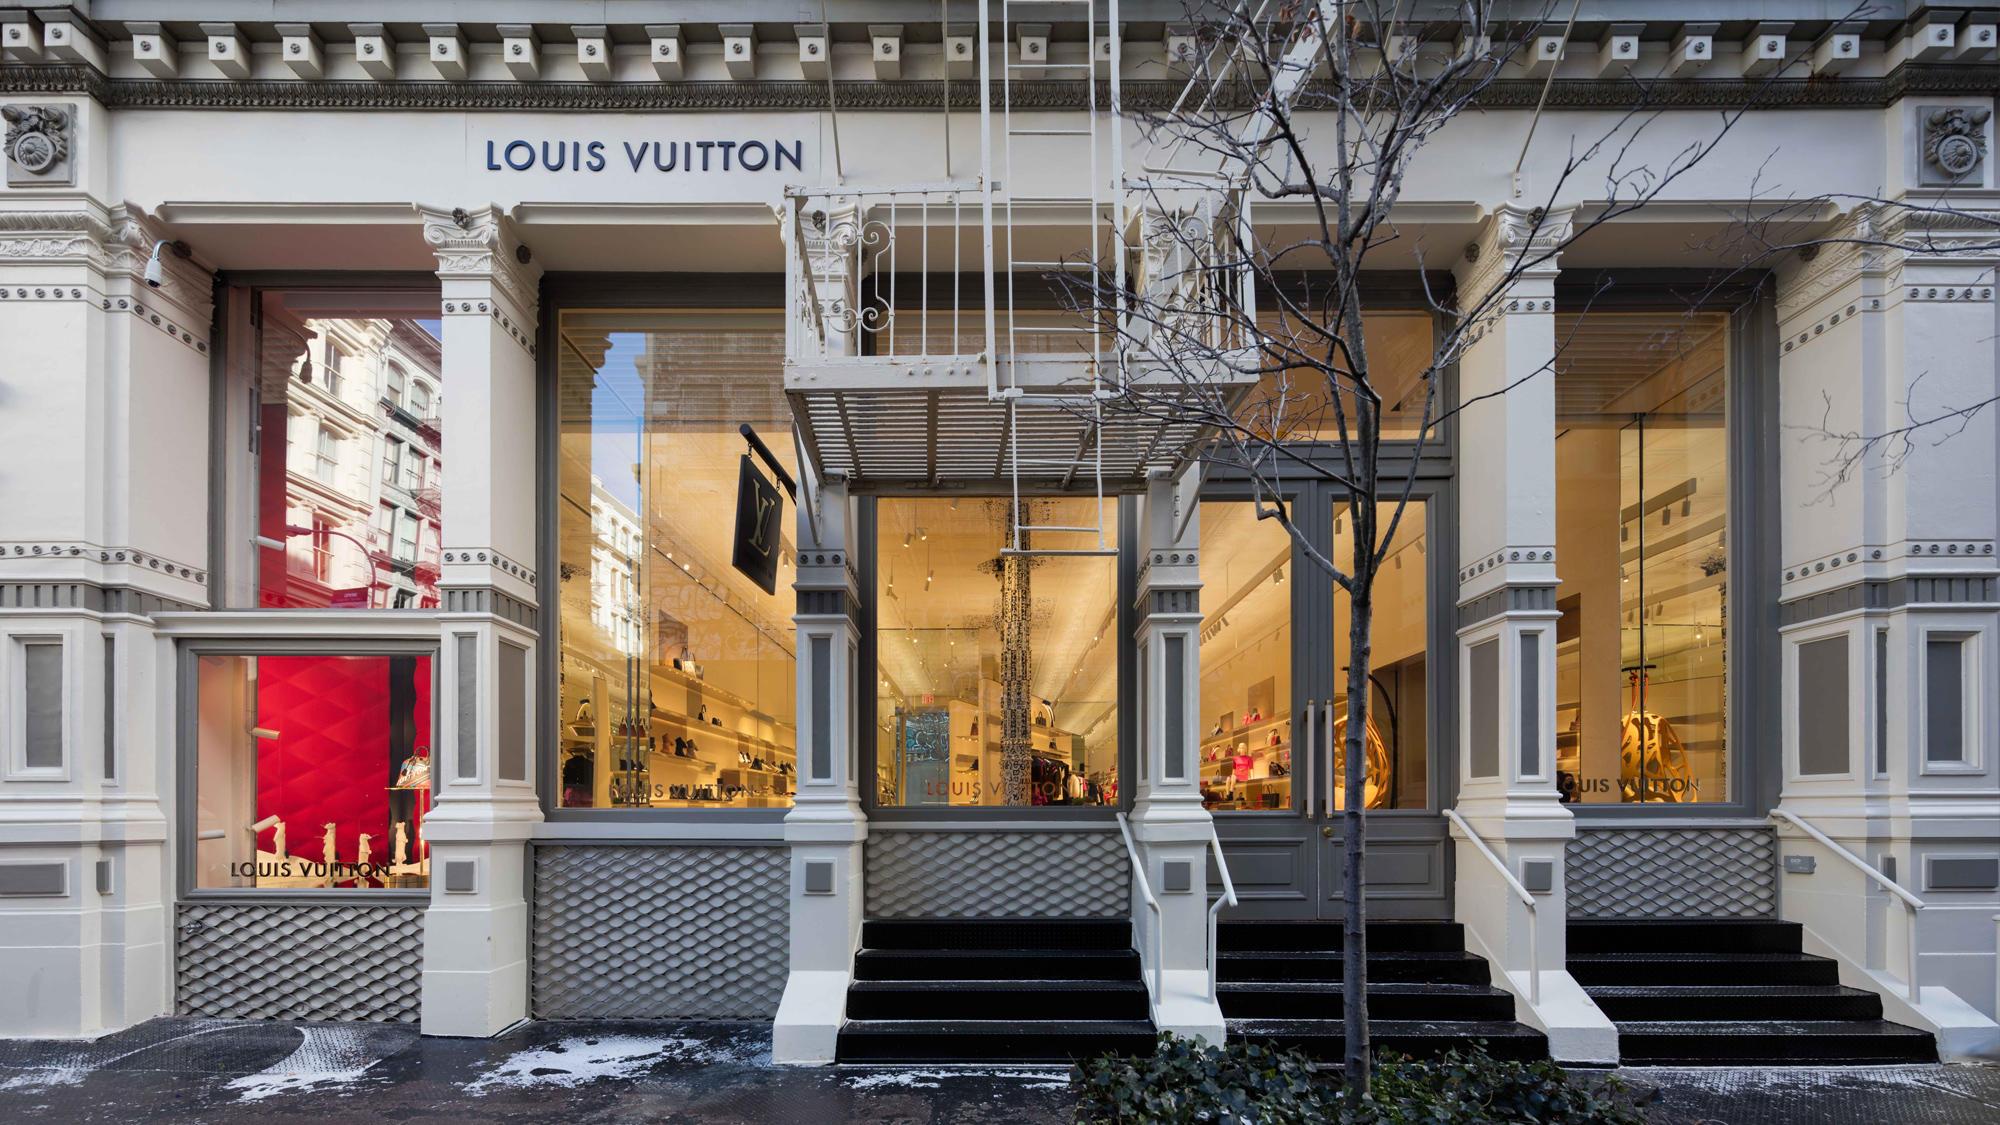 Louis Vuitton New York SoHo image 0